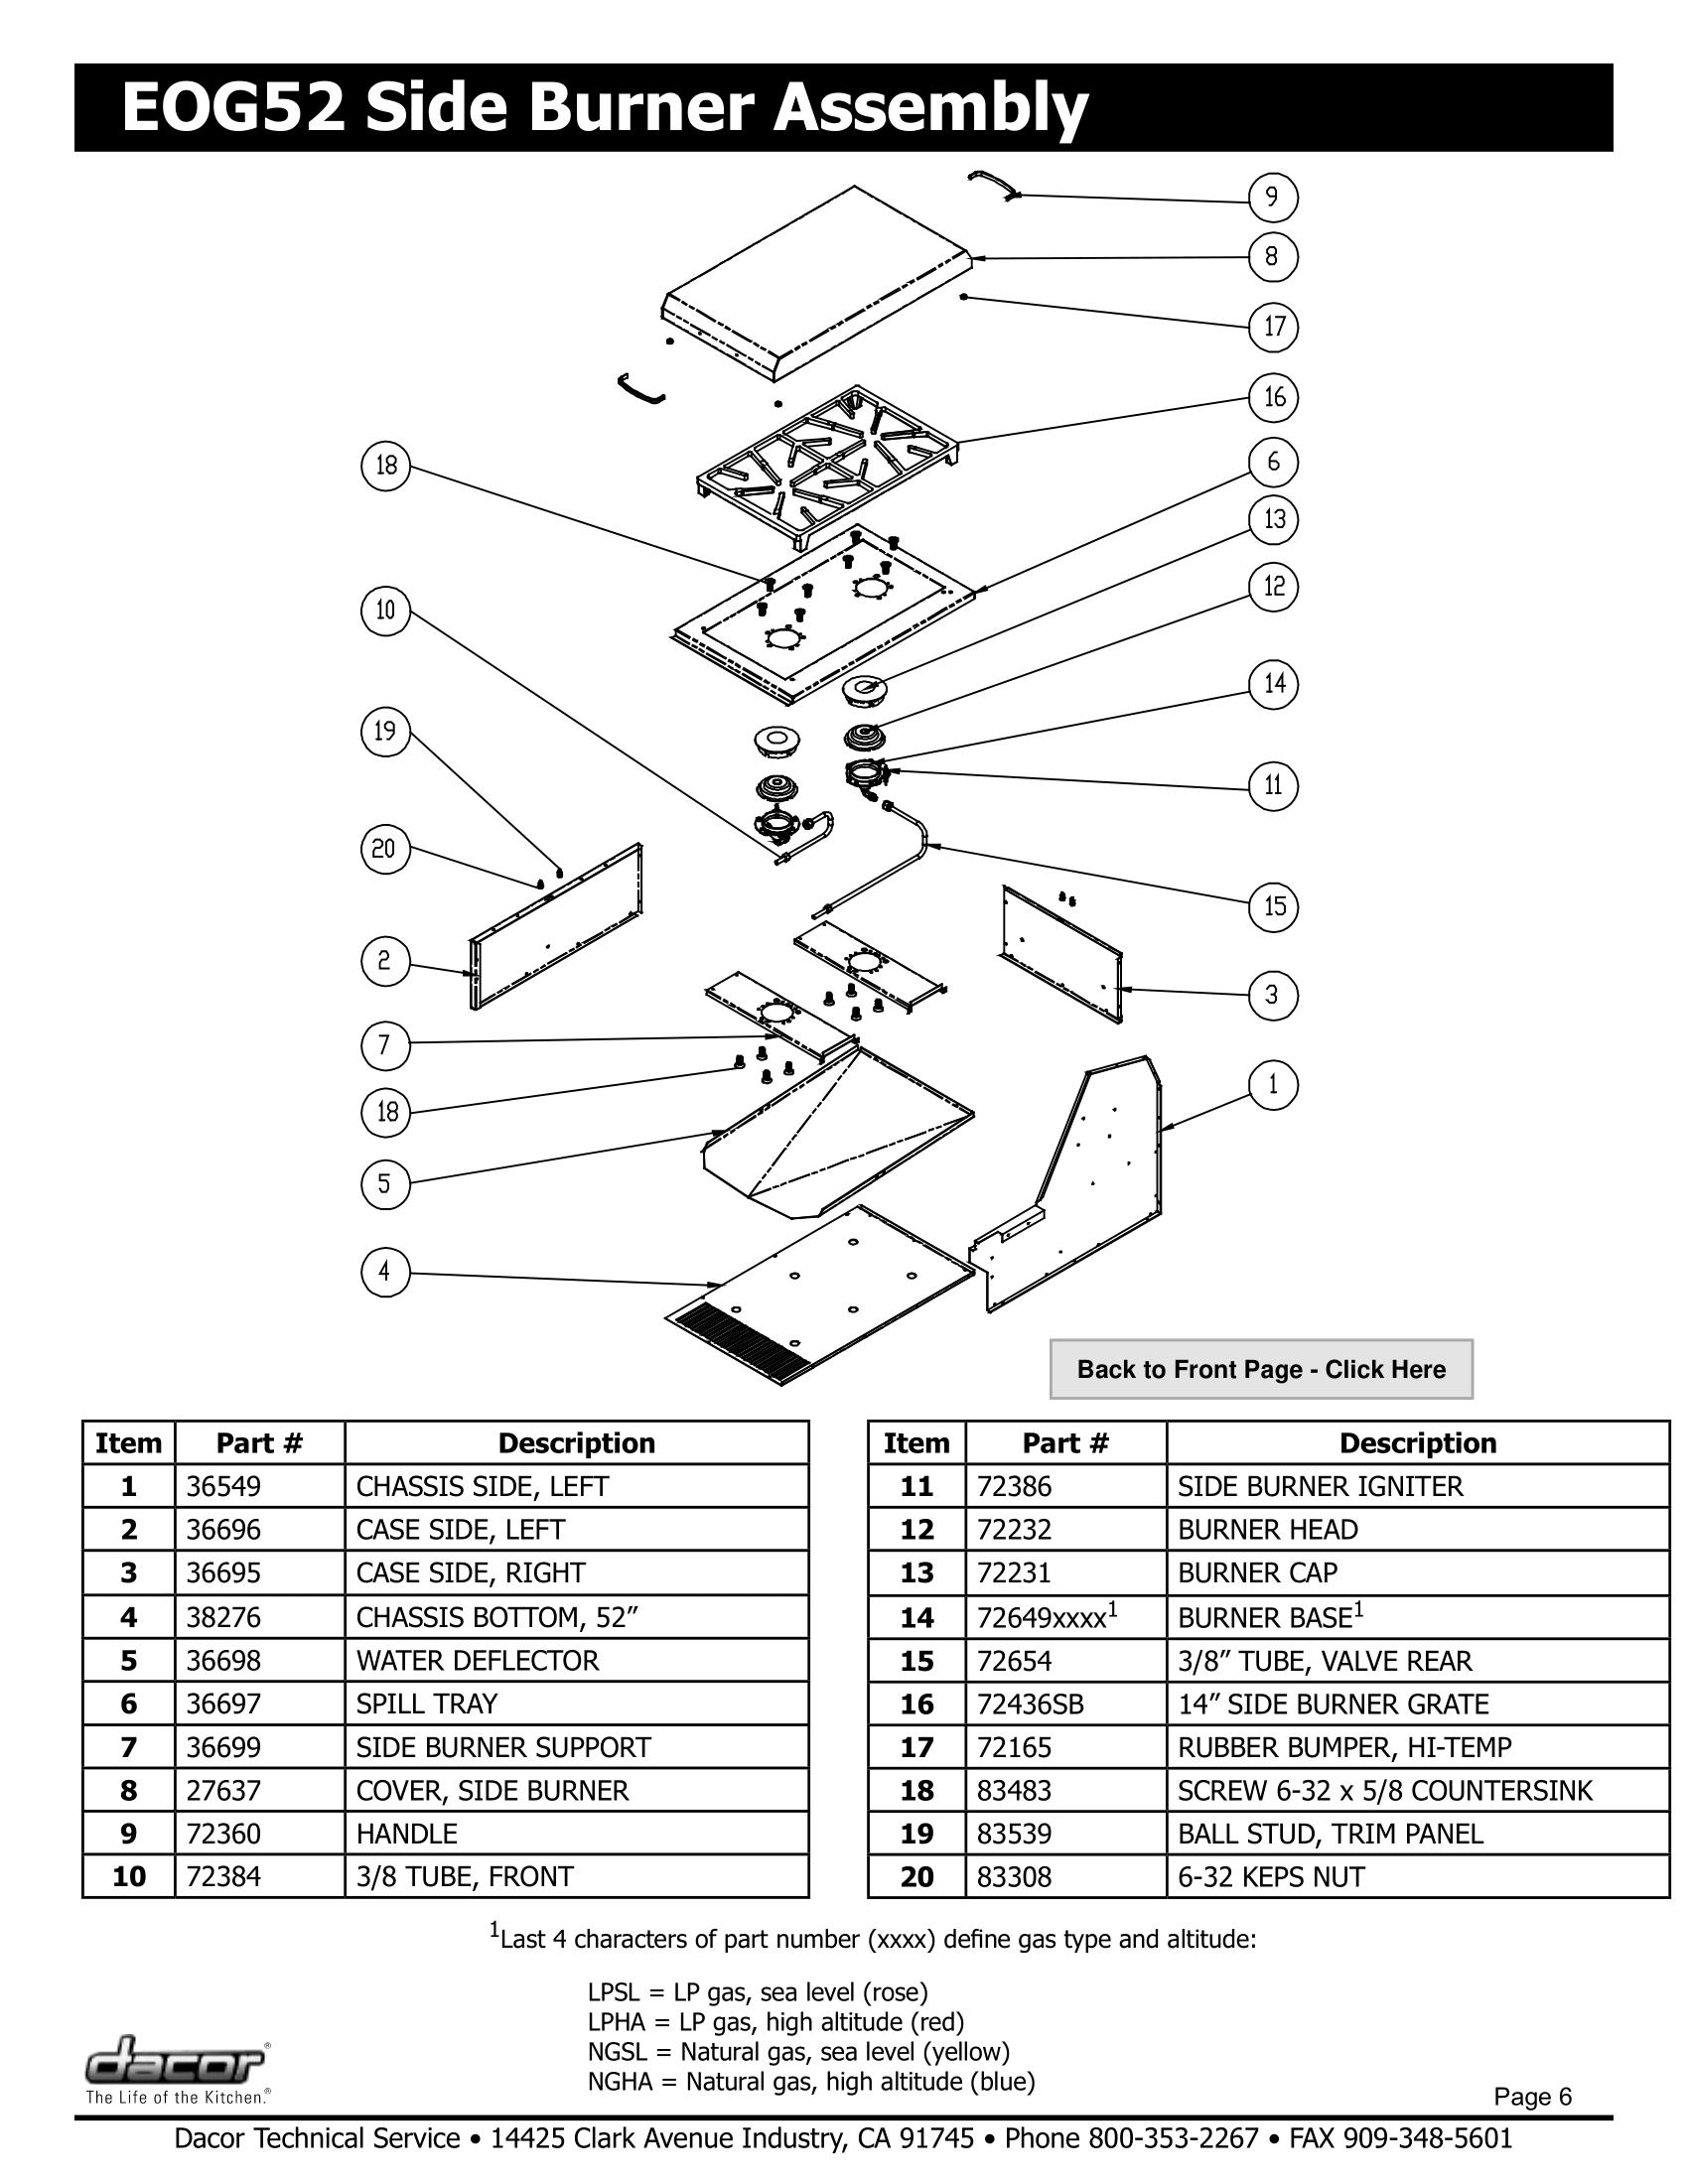 Dacor EOG52 Side Burner Assembly Schematic